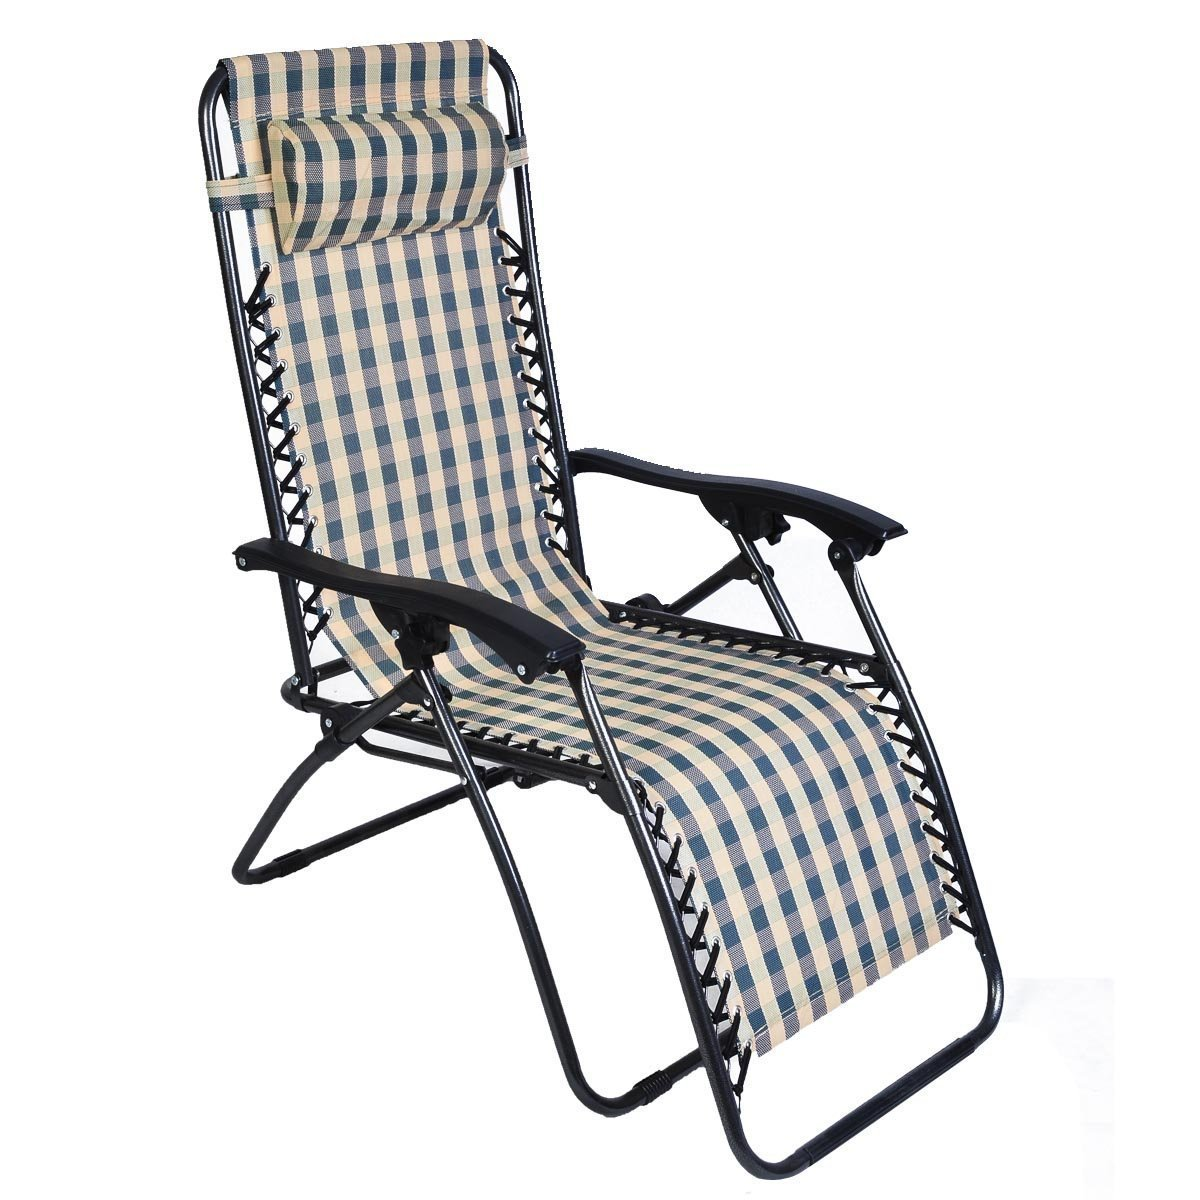 Polar aurora zero gravity chair review for Chair zero review